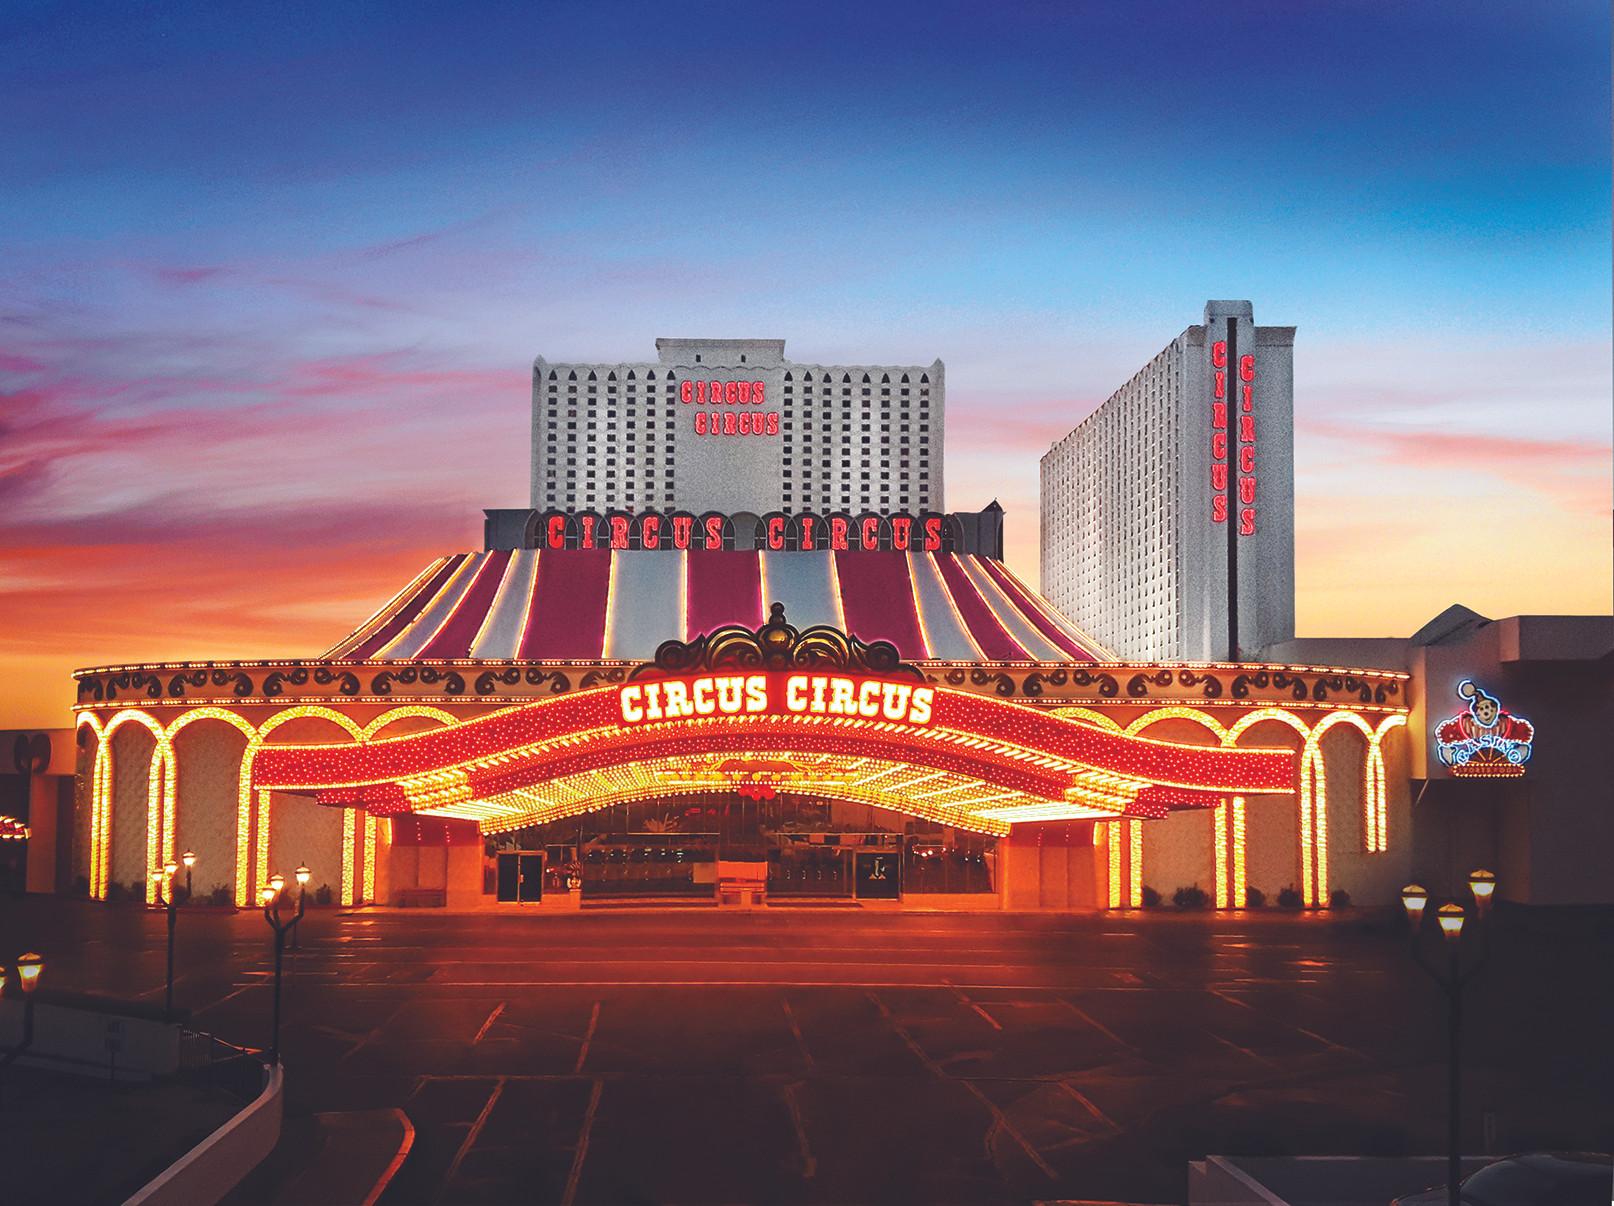 Casino Circus Circus